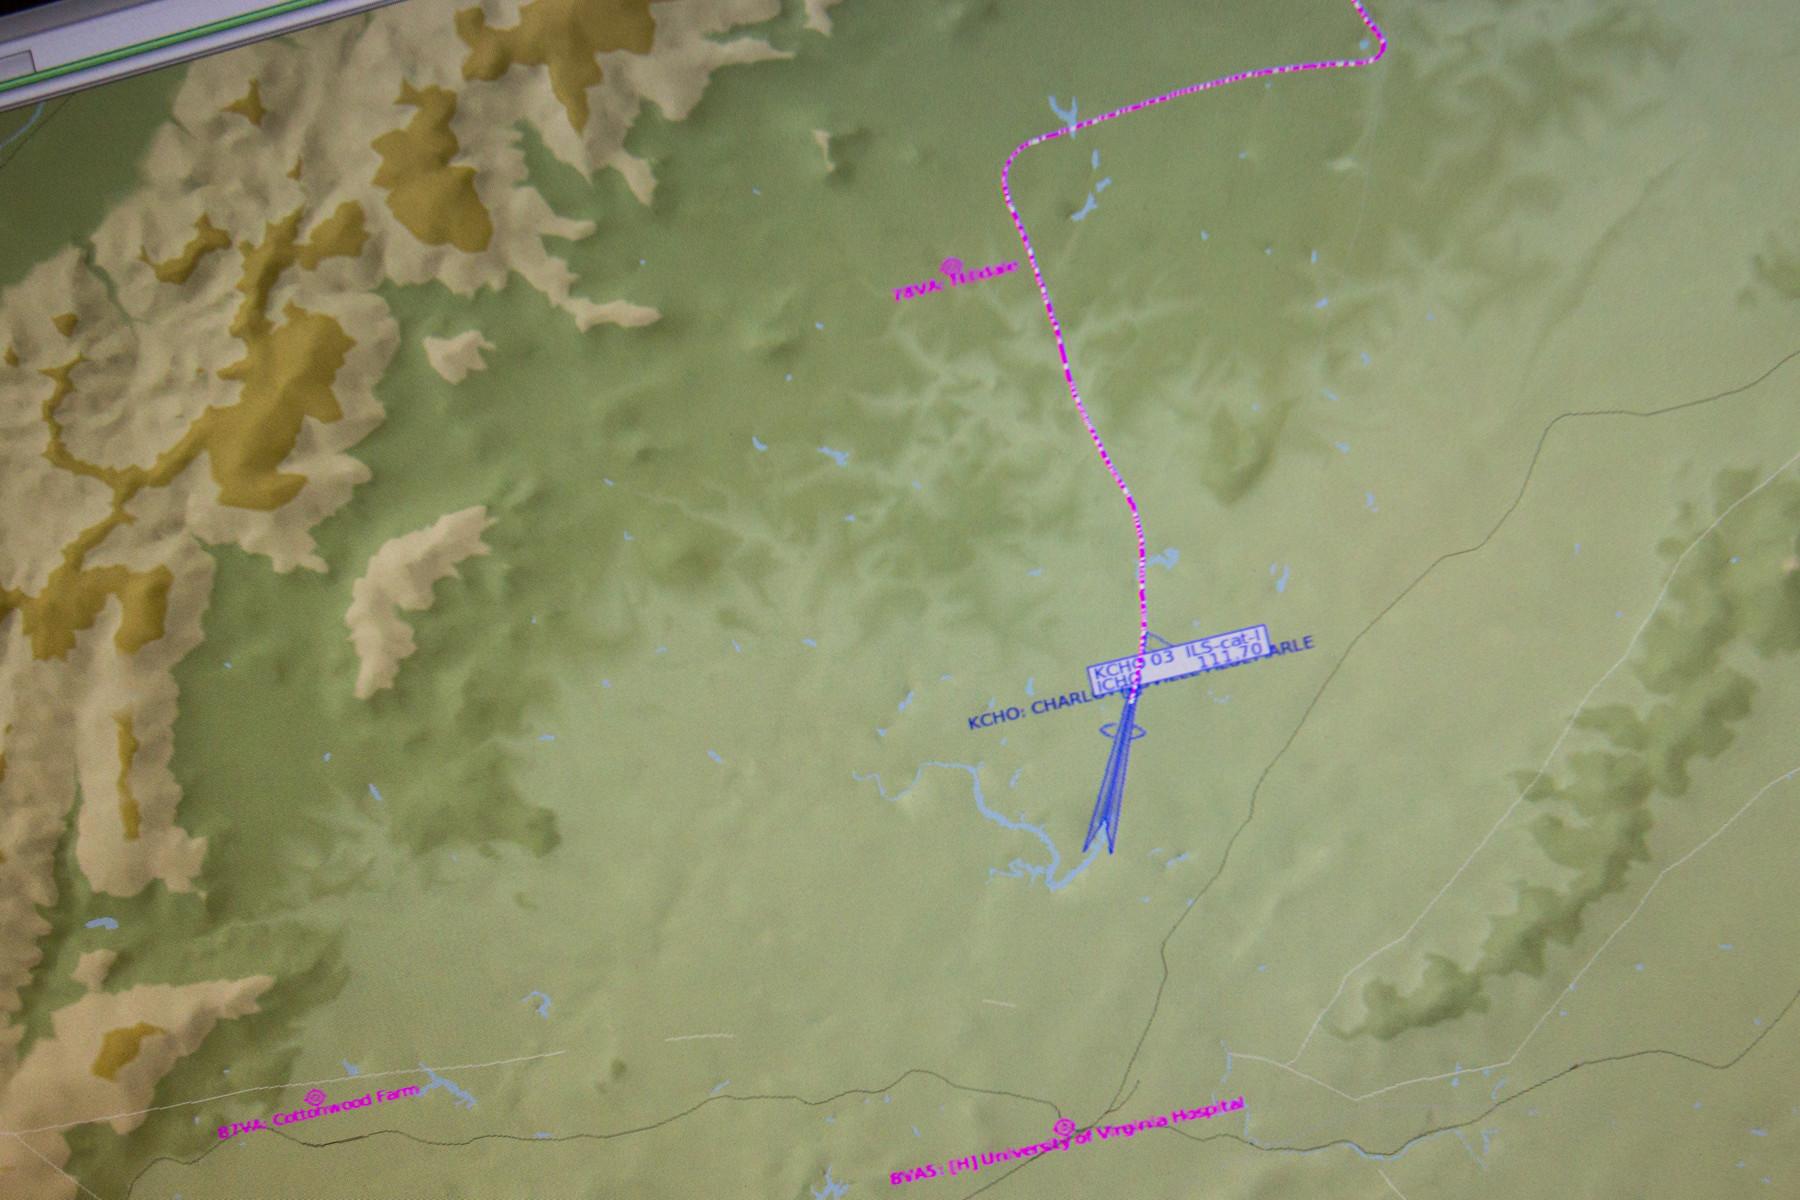 A flight path as portrayed on the flight simulator.